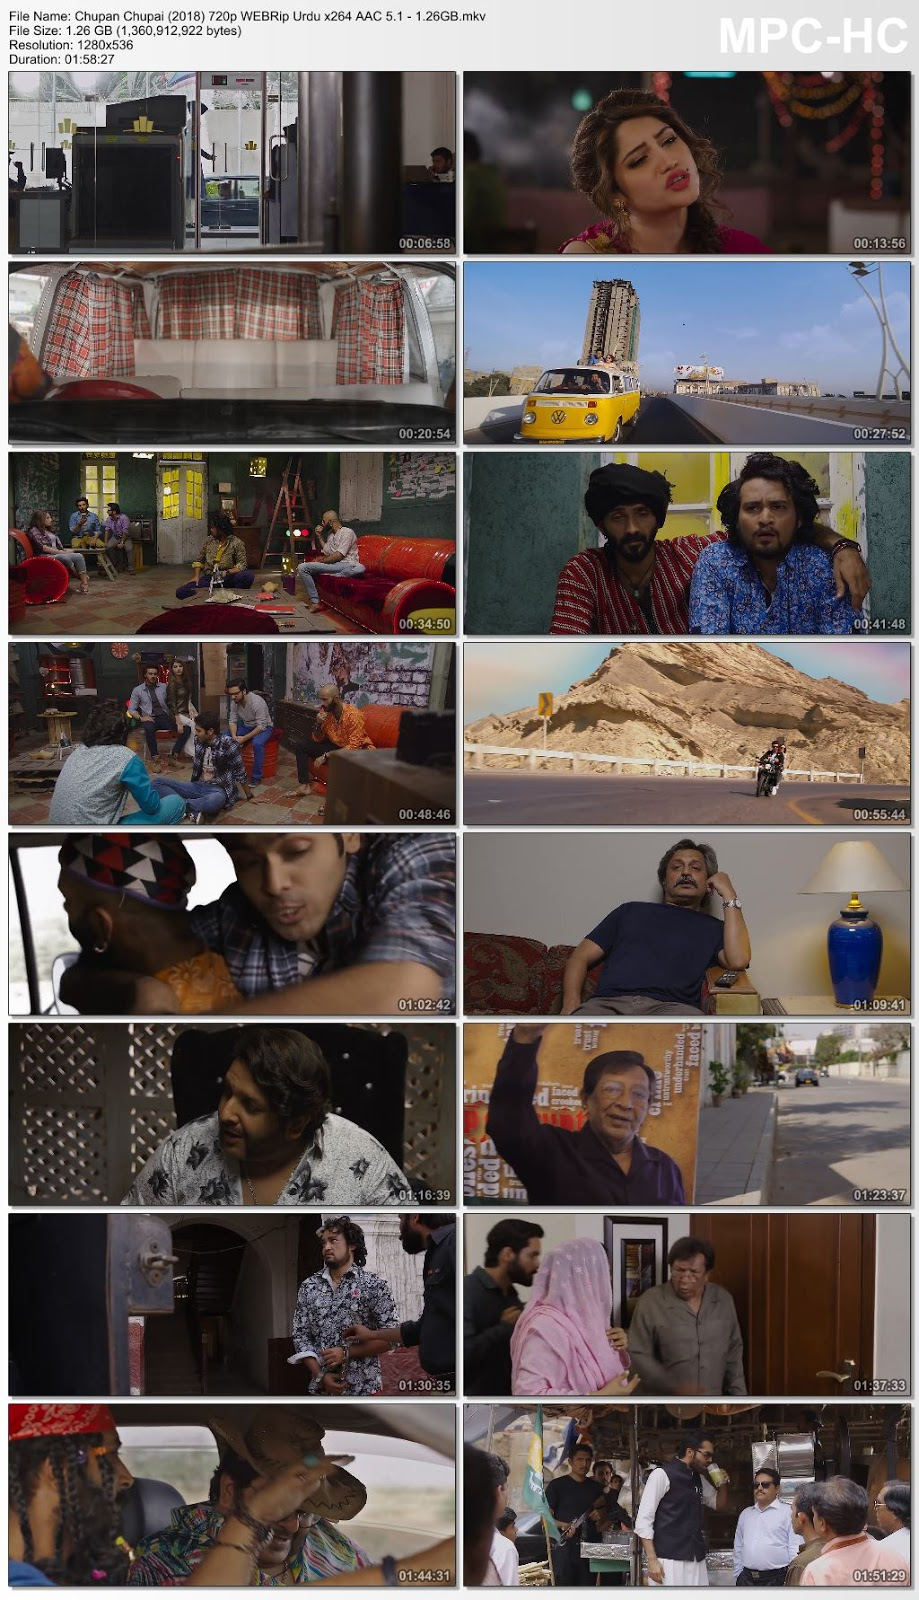 Chupan Chupai (2018) Urdu 480p WEBRip x264 AAC – 350MB Desirehub